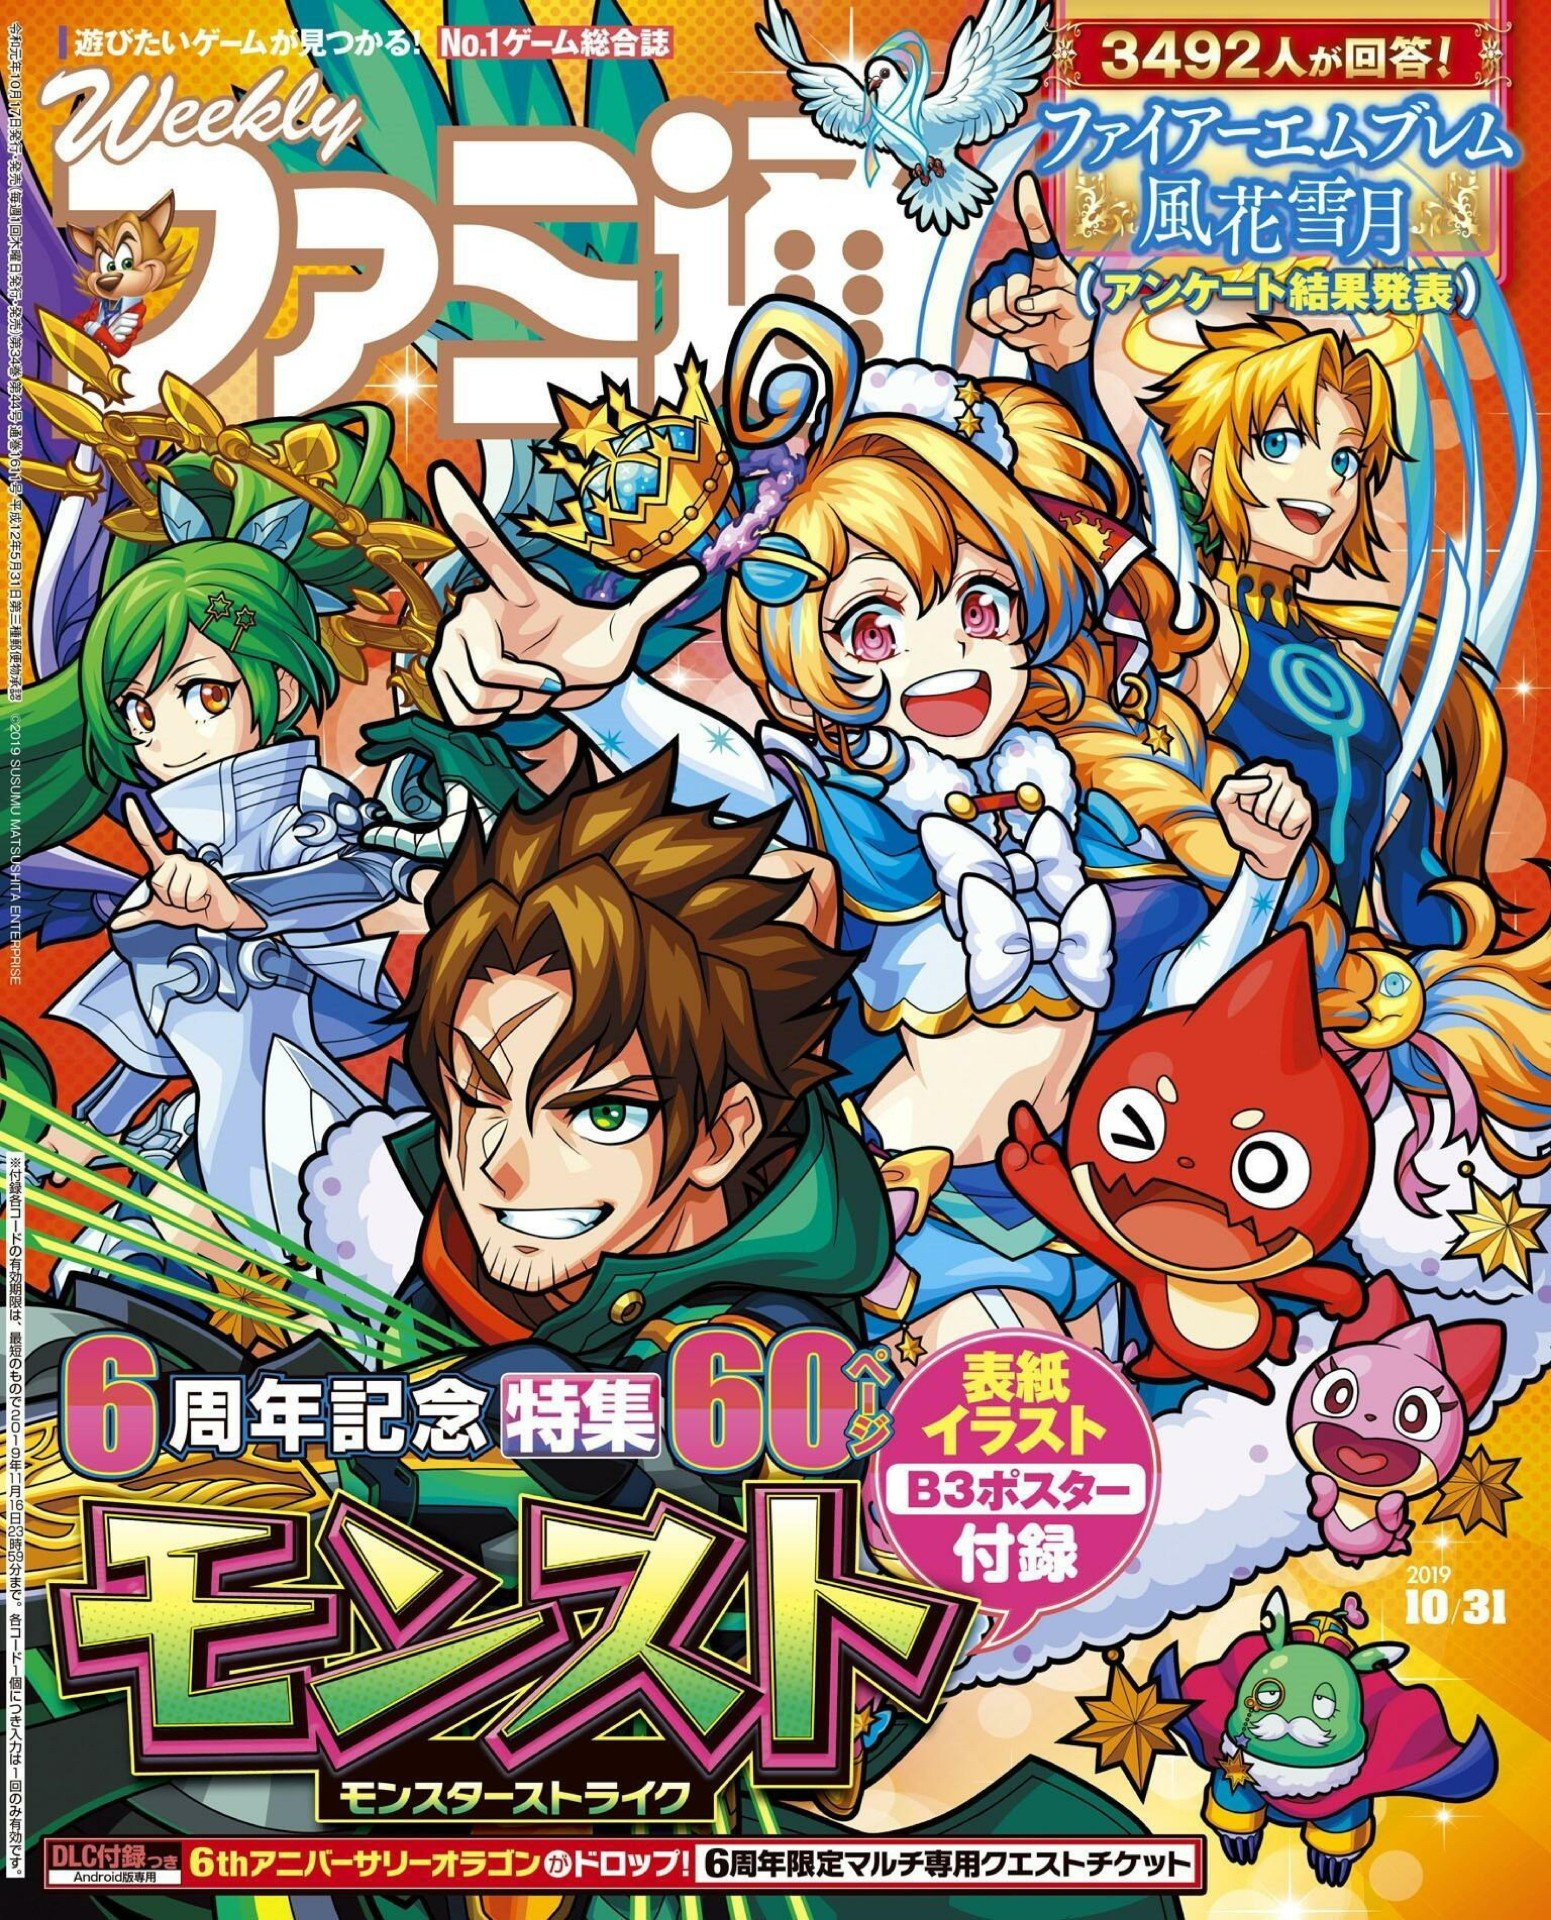 Famitsu 1611 (October 31, 2019)